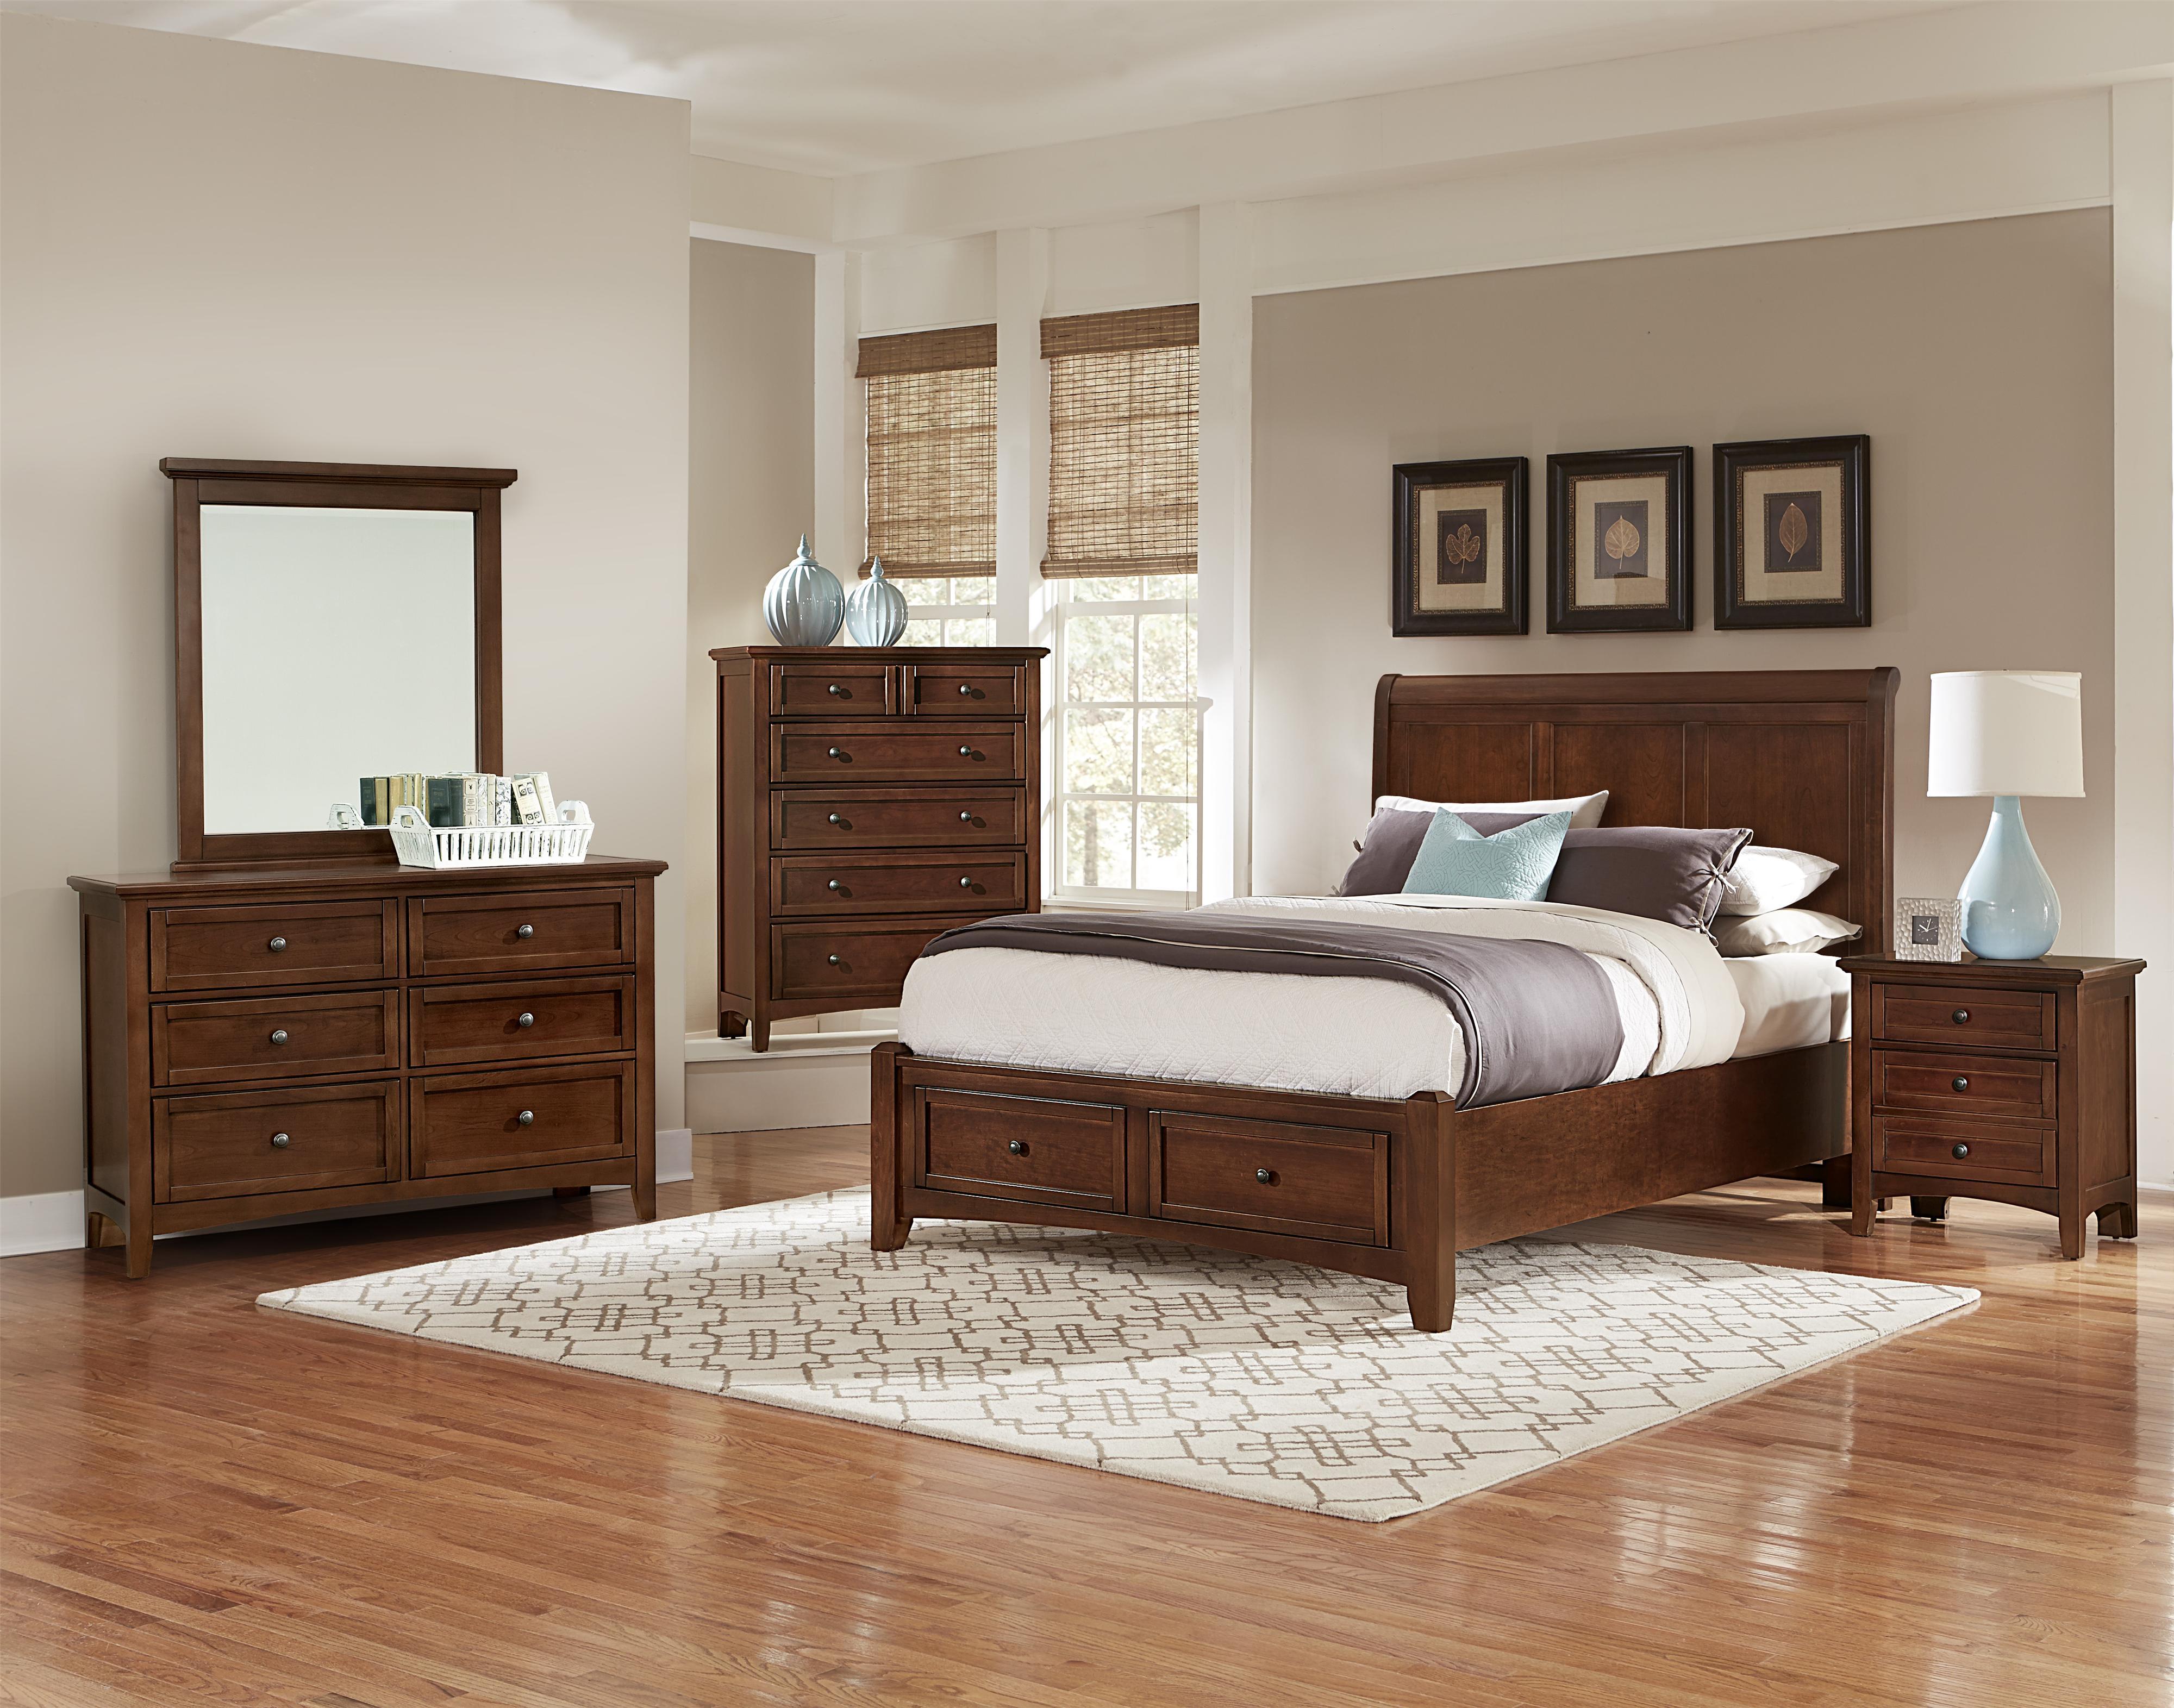 Vaughan Bassett Bonanza Full Bedroom Group Wayside Furniture Bedroom Groups